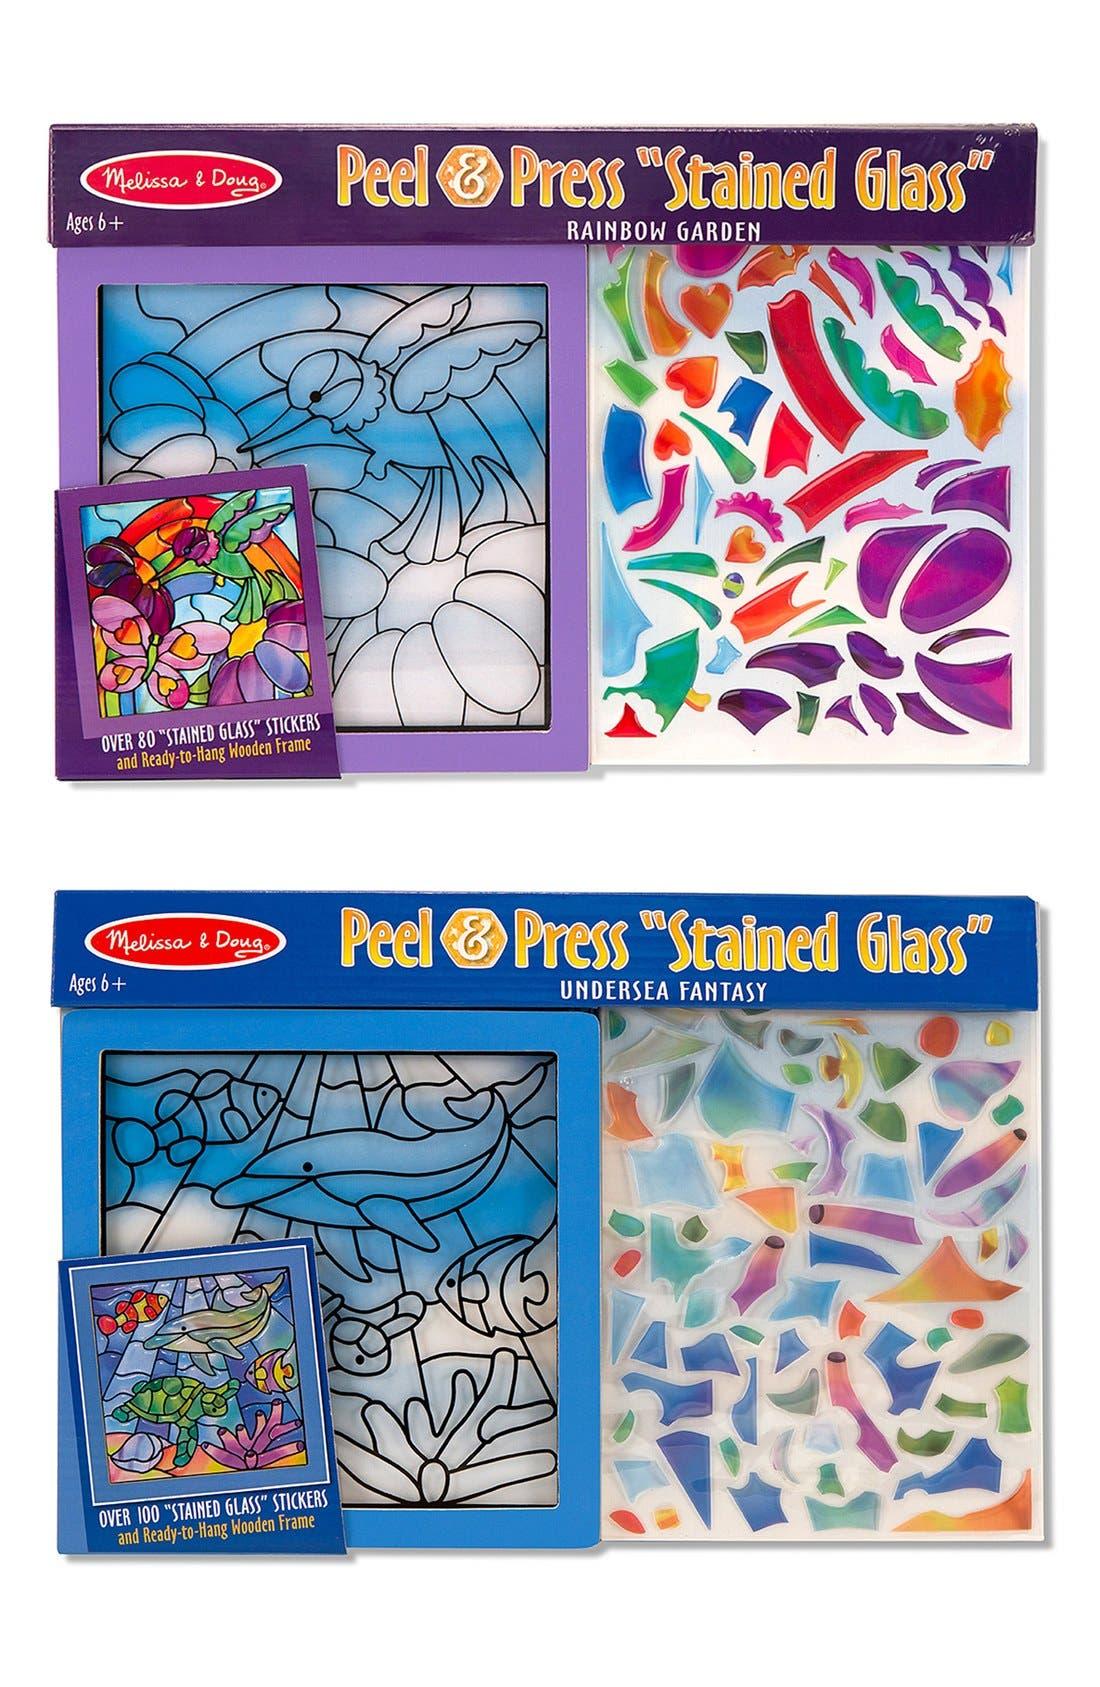 Melissa & Doug 'Undersea Fantasy & Rainbow Garden' Peel & Press Sticker Kits (2-Pack)